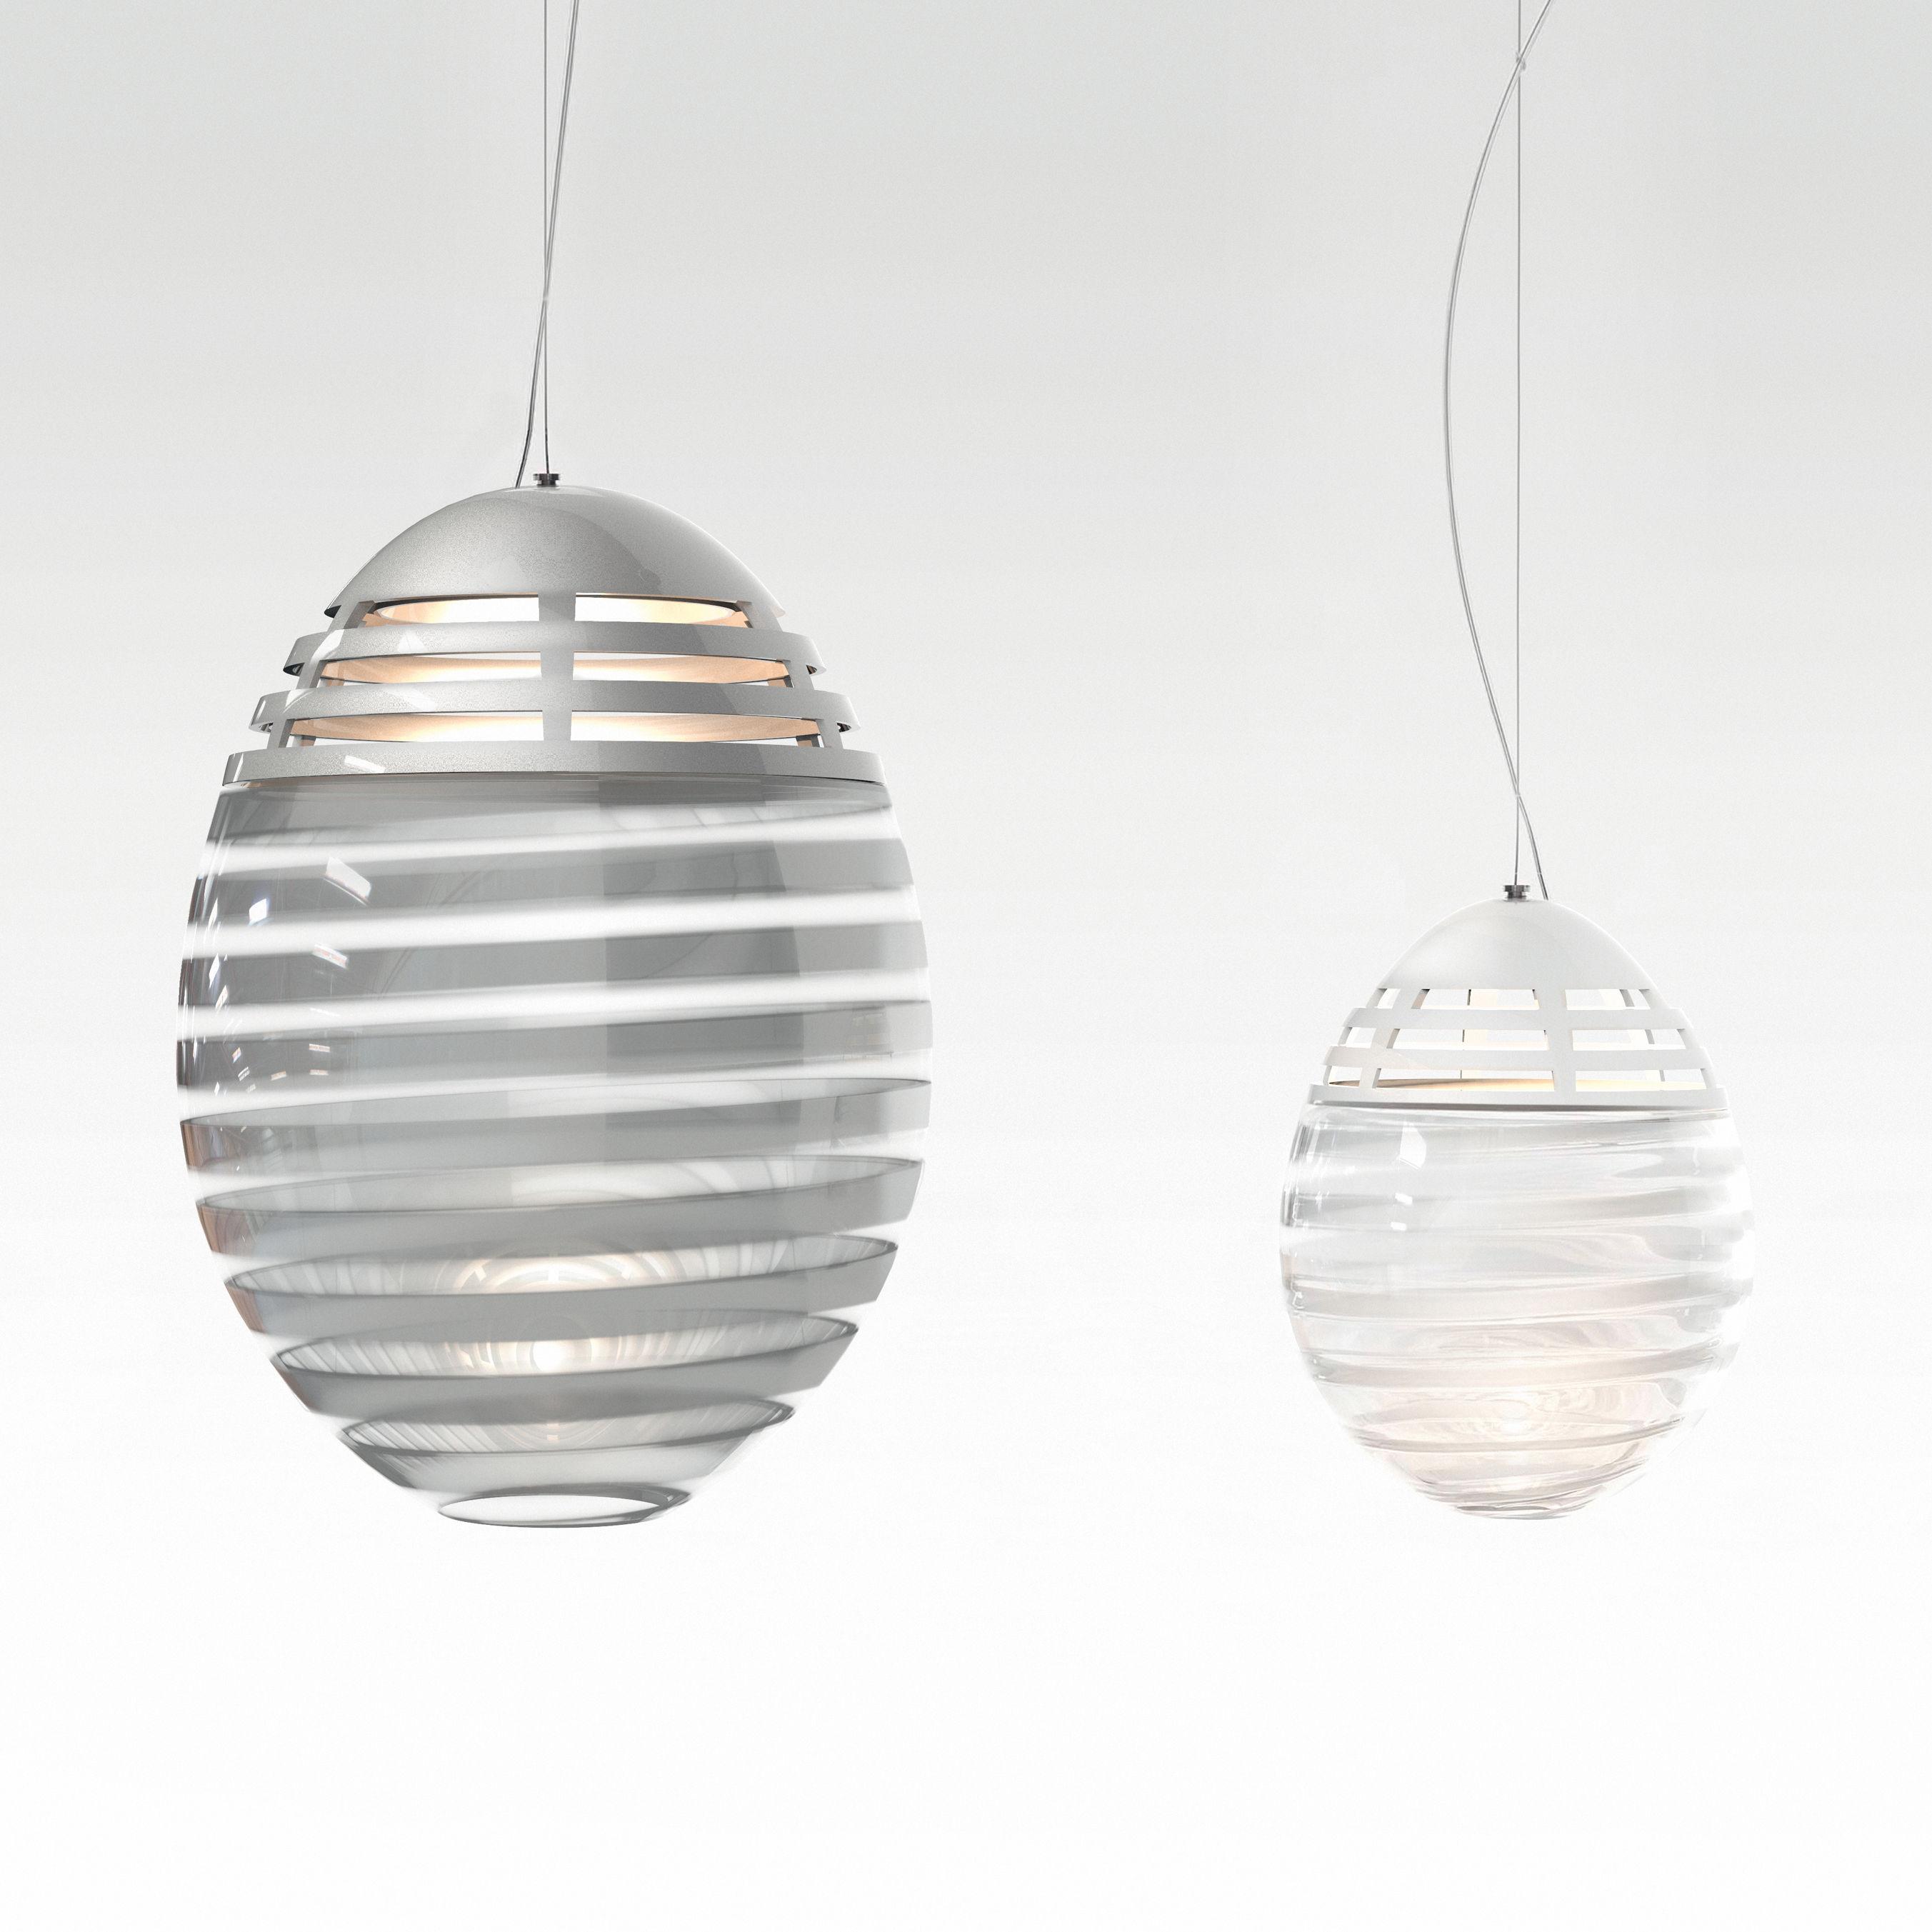 suspension incalmo led 39 x h53 cm verre souffl aluminium bandes blanches transparent. Black Bedroom Furniture Sets. Home Design Ideas